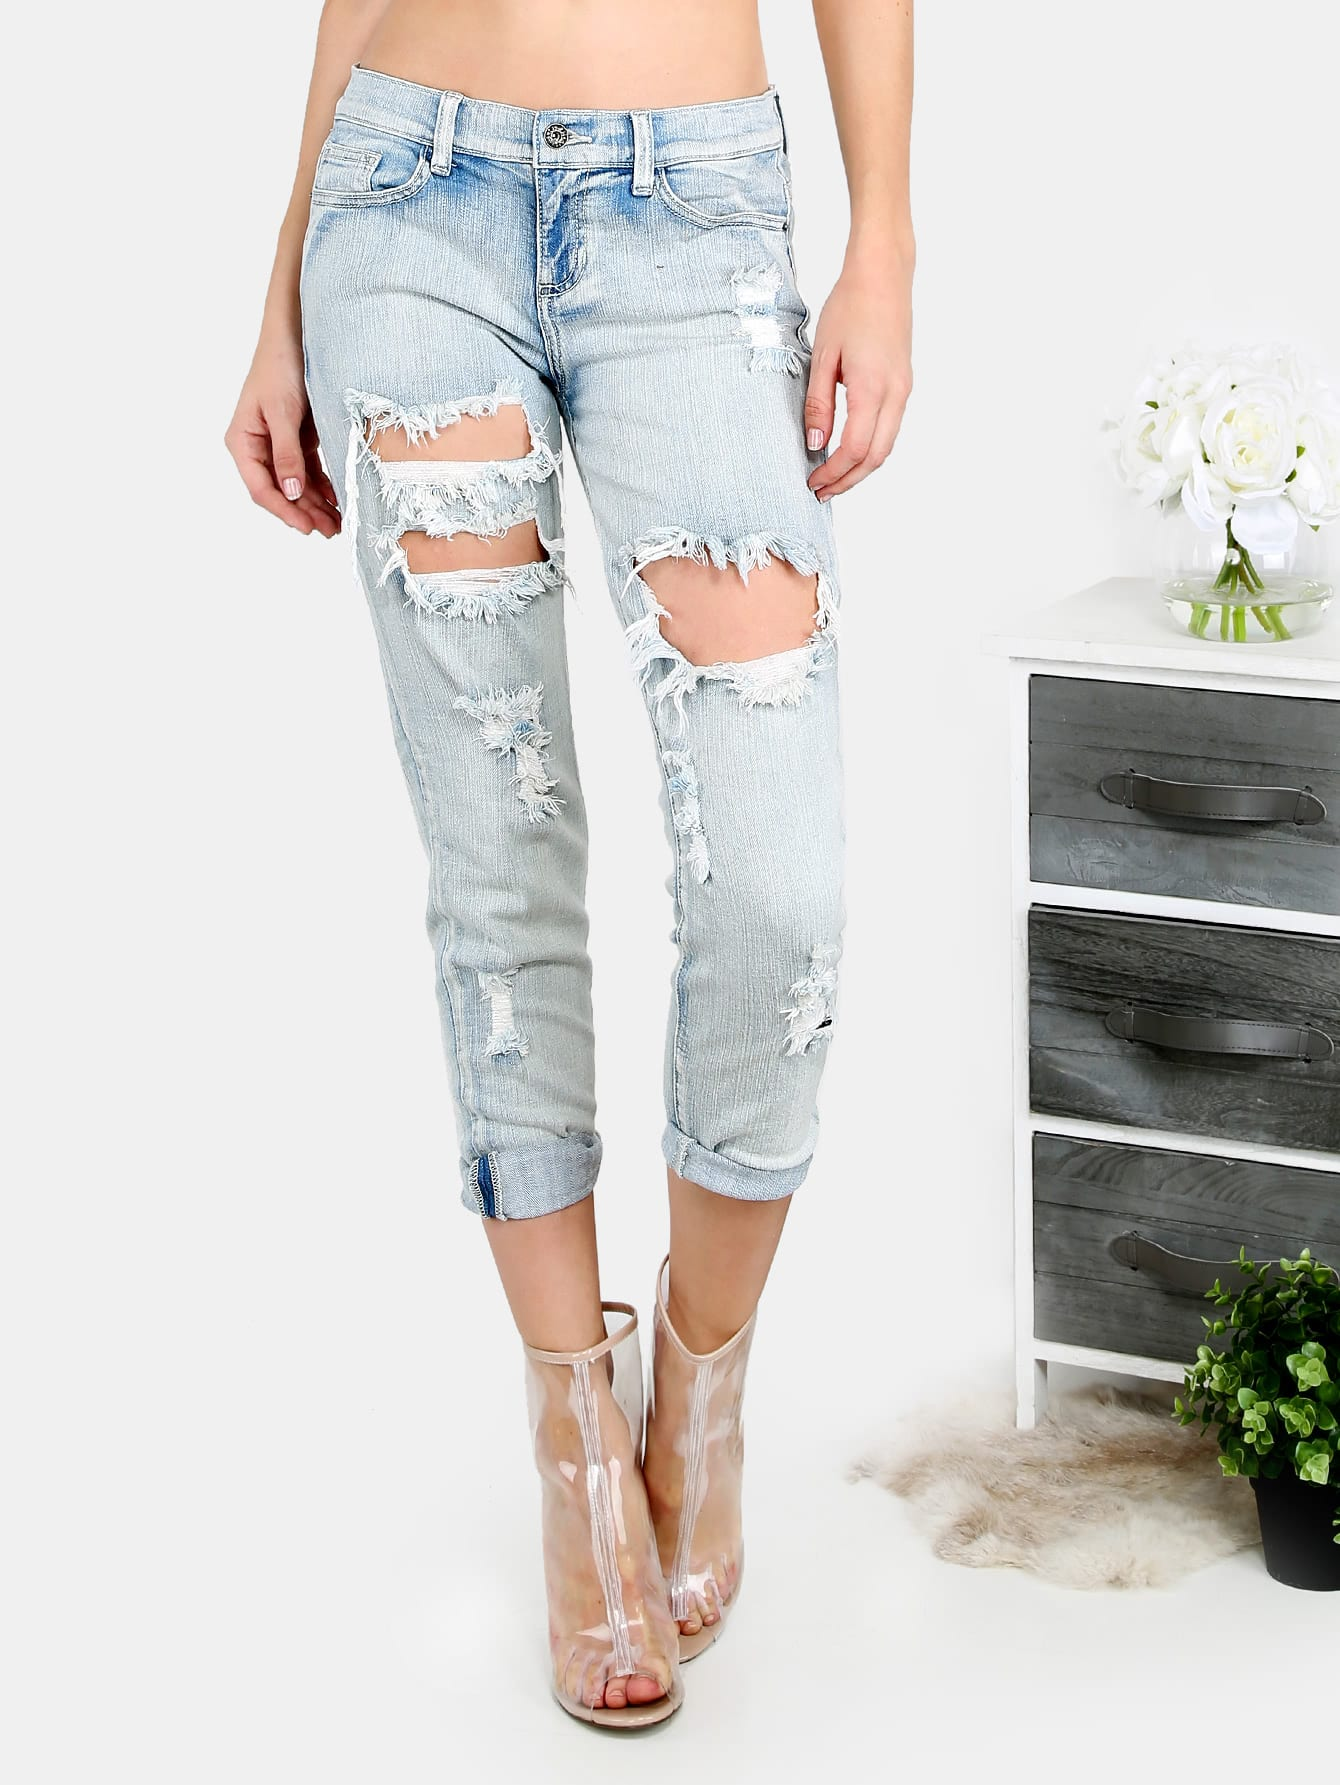 Light Blue Pocket Cutout Ripped JeansLight Blue Pocket Cutout Ripped Jeans<br><br>color: Blue<br>size: M,XS